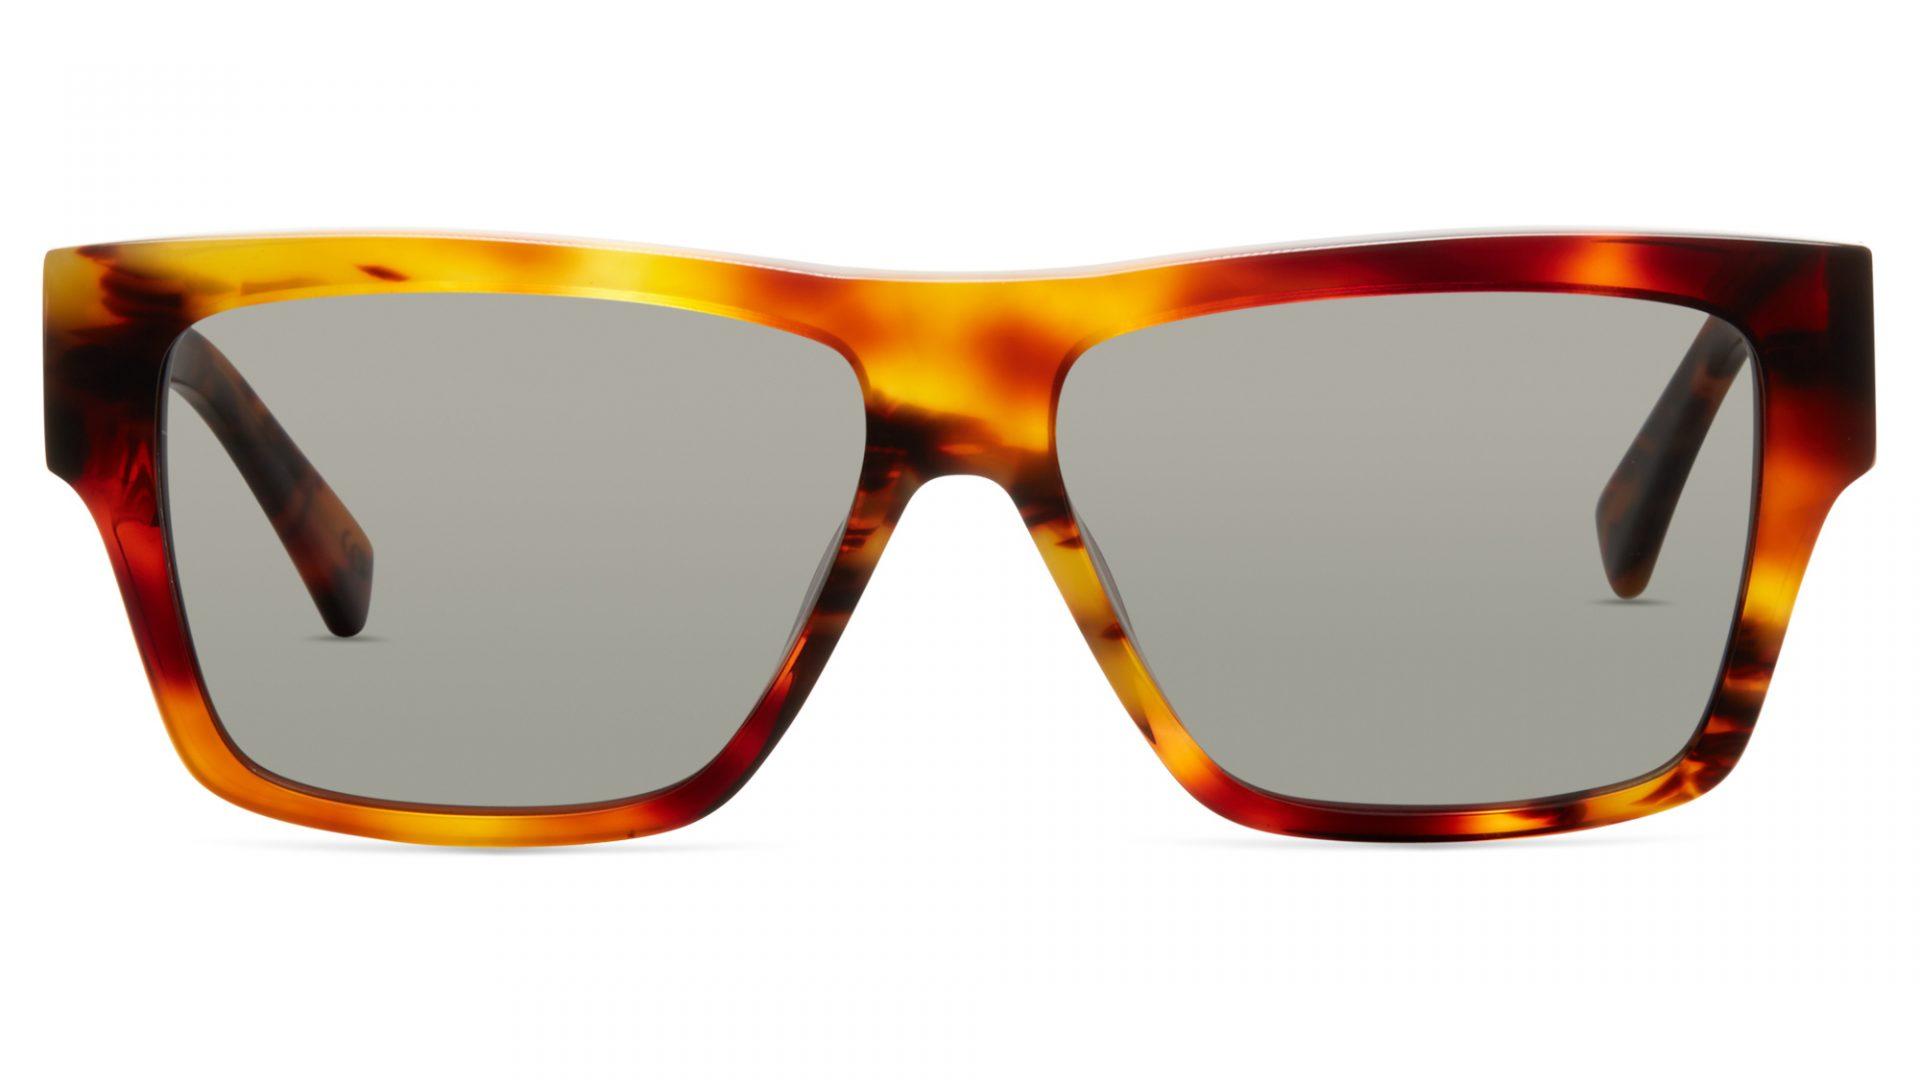 Von Zipper SS21 Sunglasses